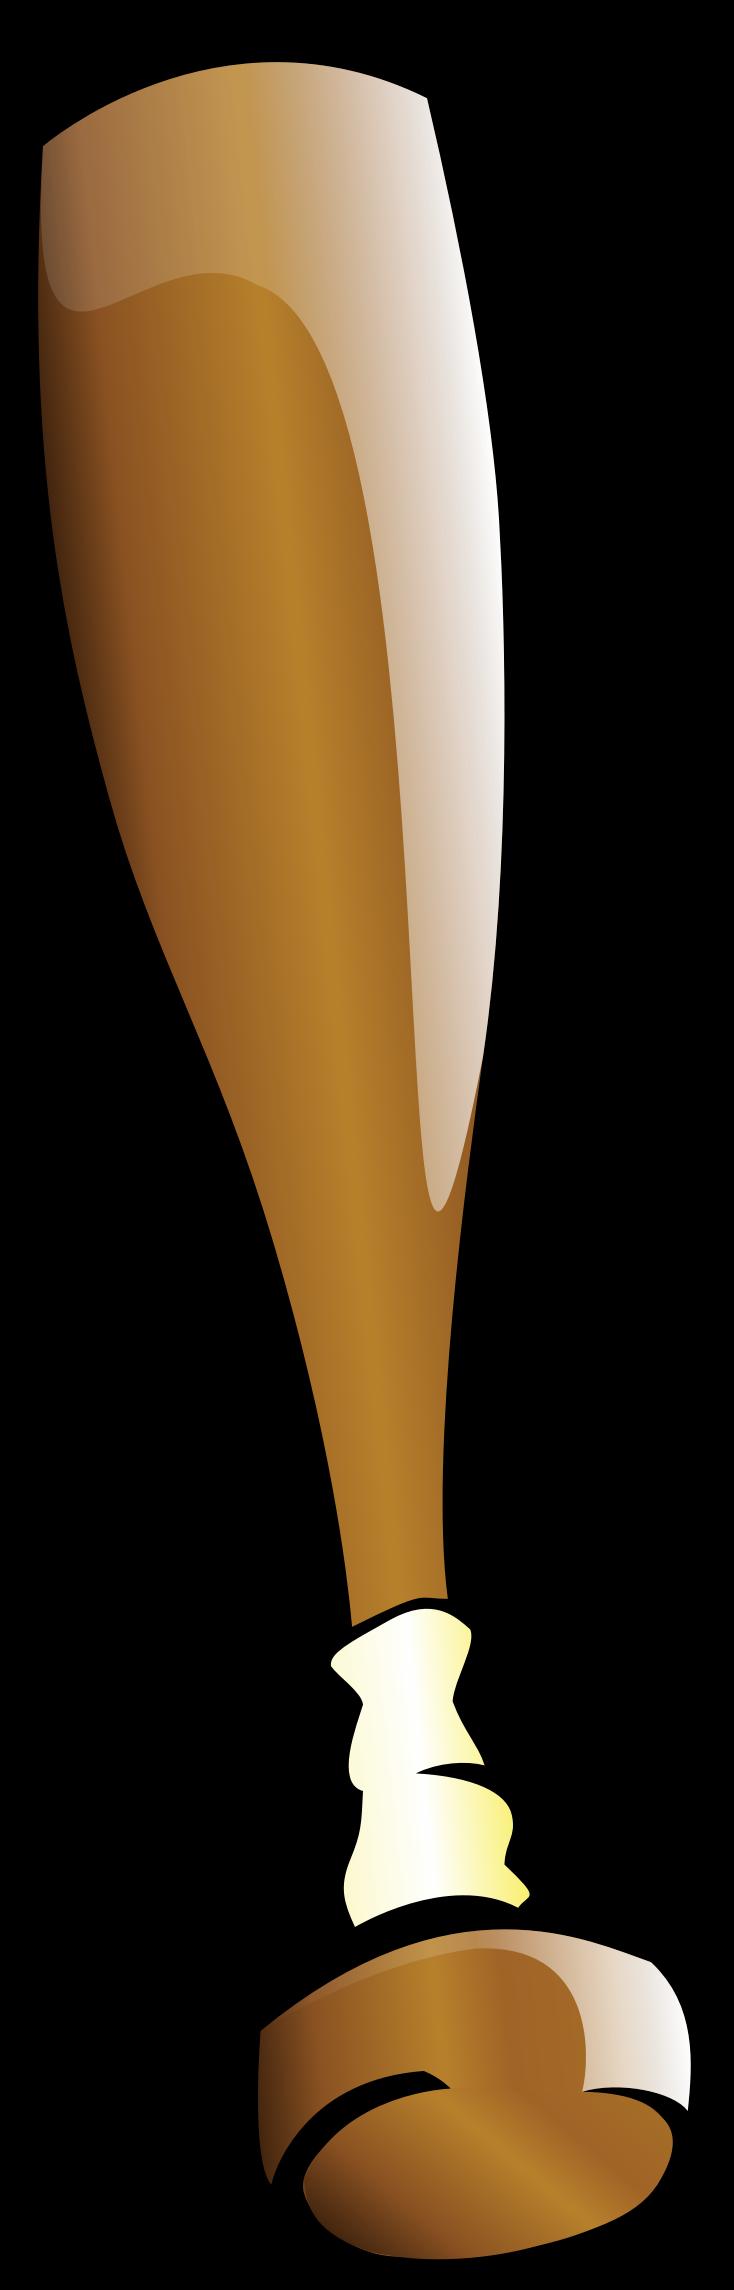 clipart baseball bat